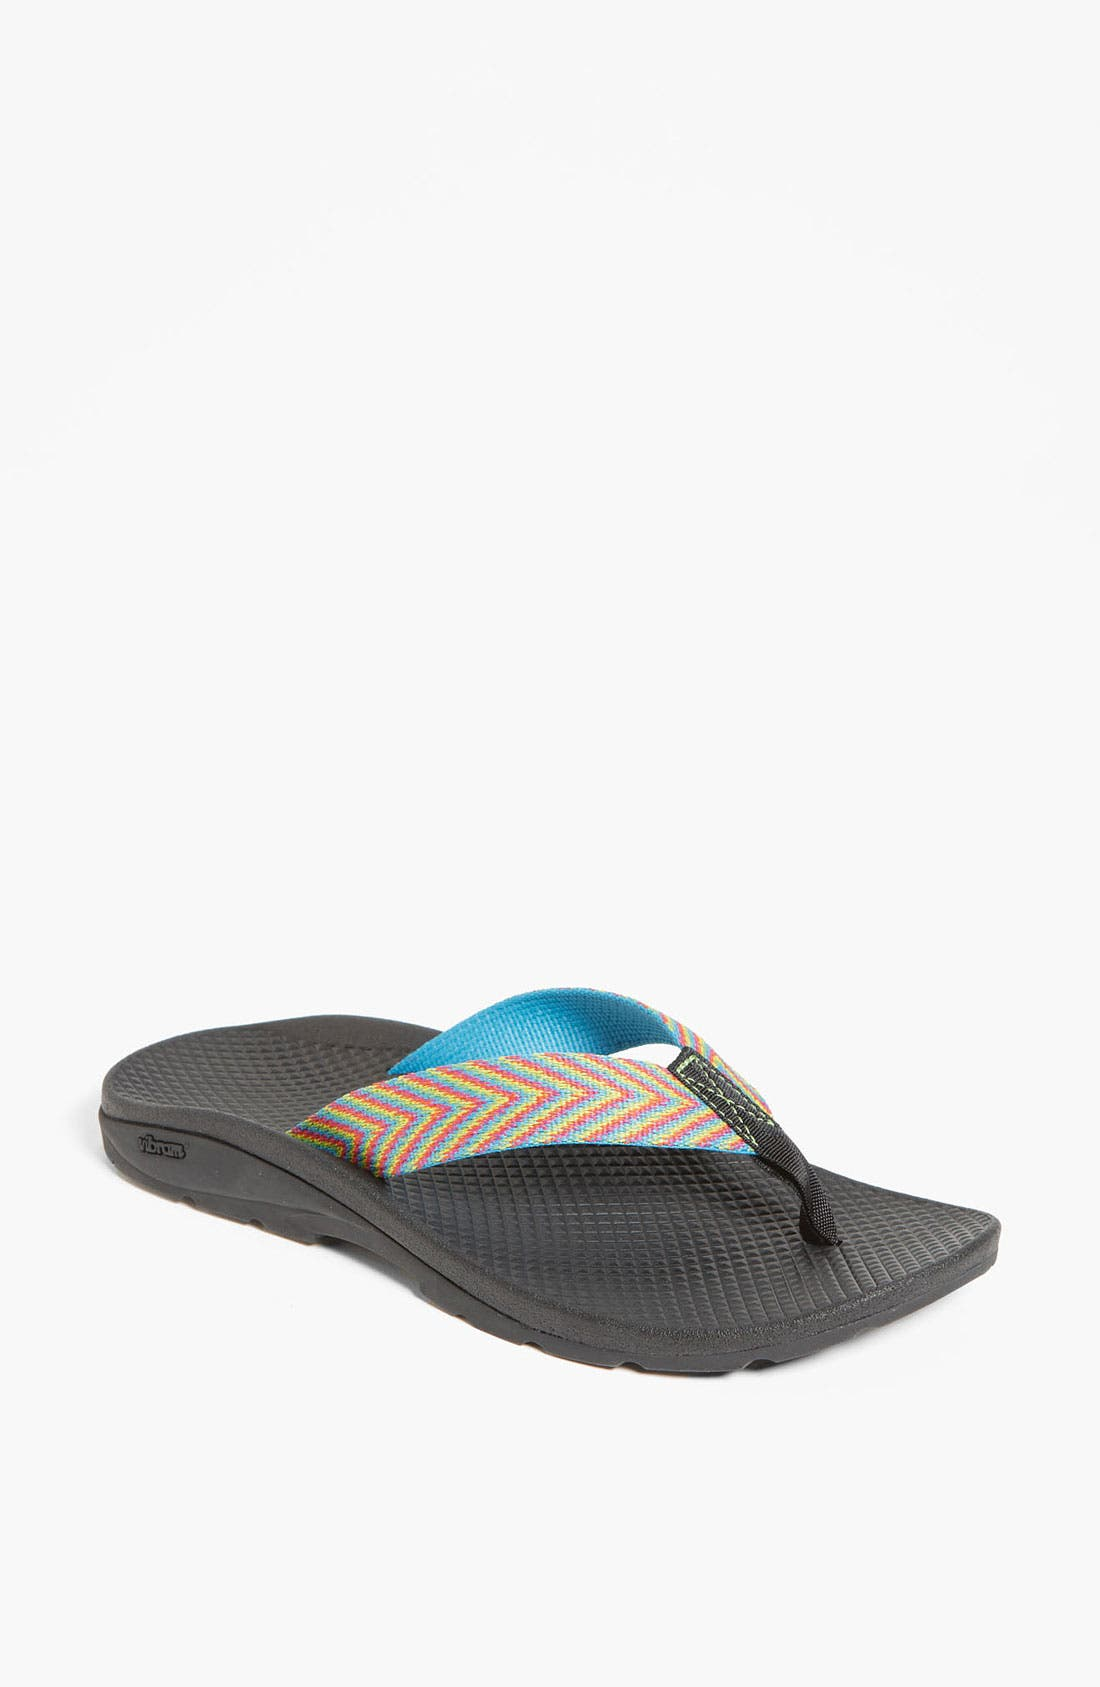 Alternate Image 1 Selected - Chaco 'Flip Vibe' Sandal